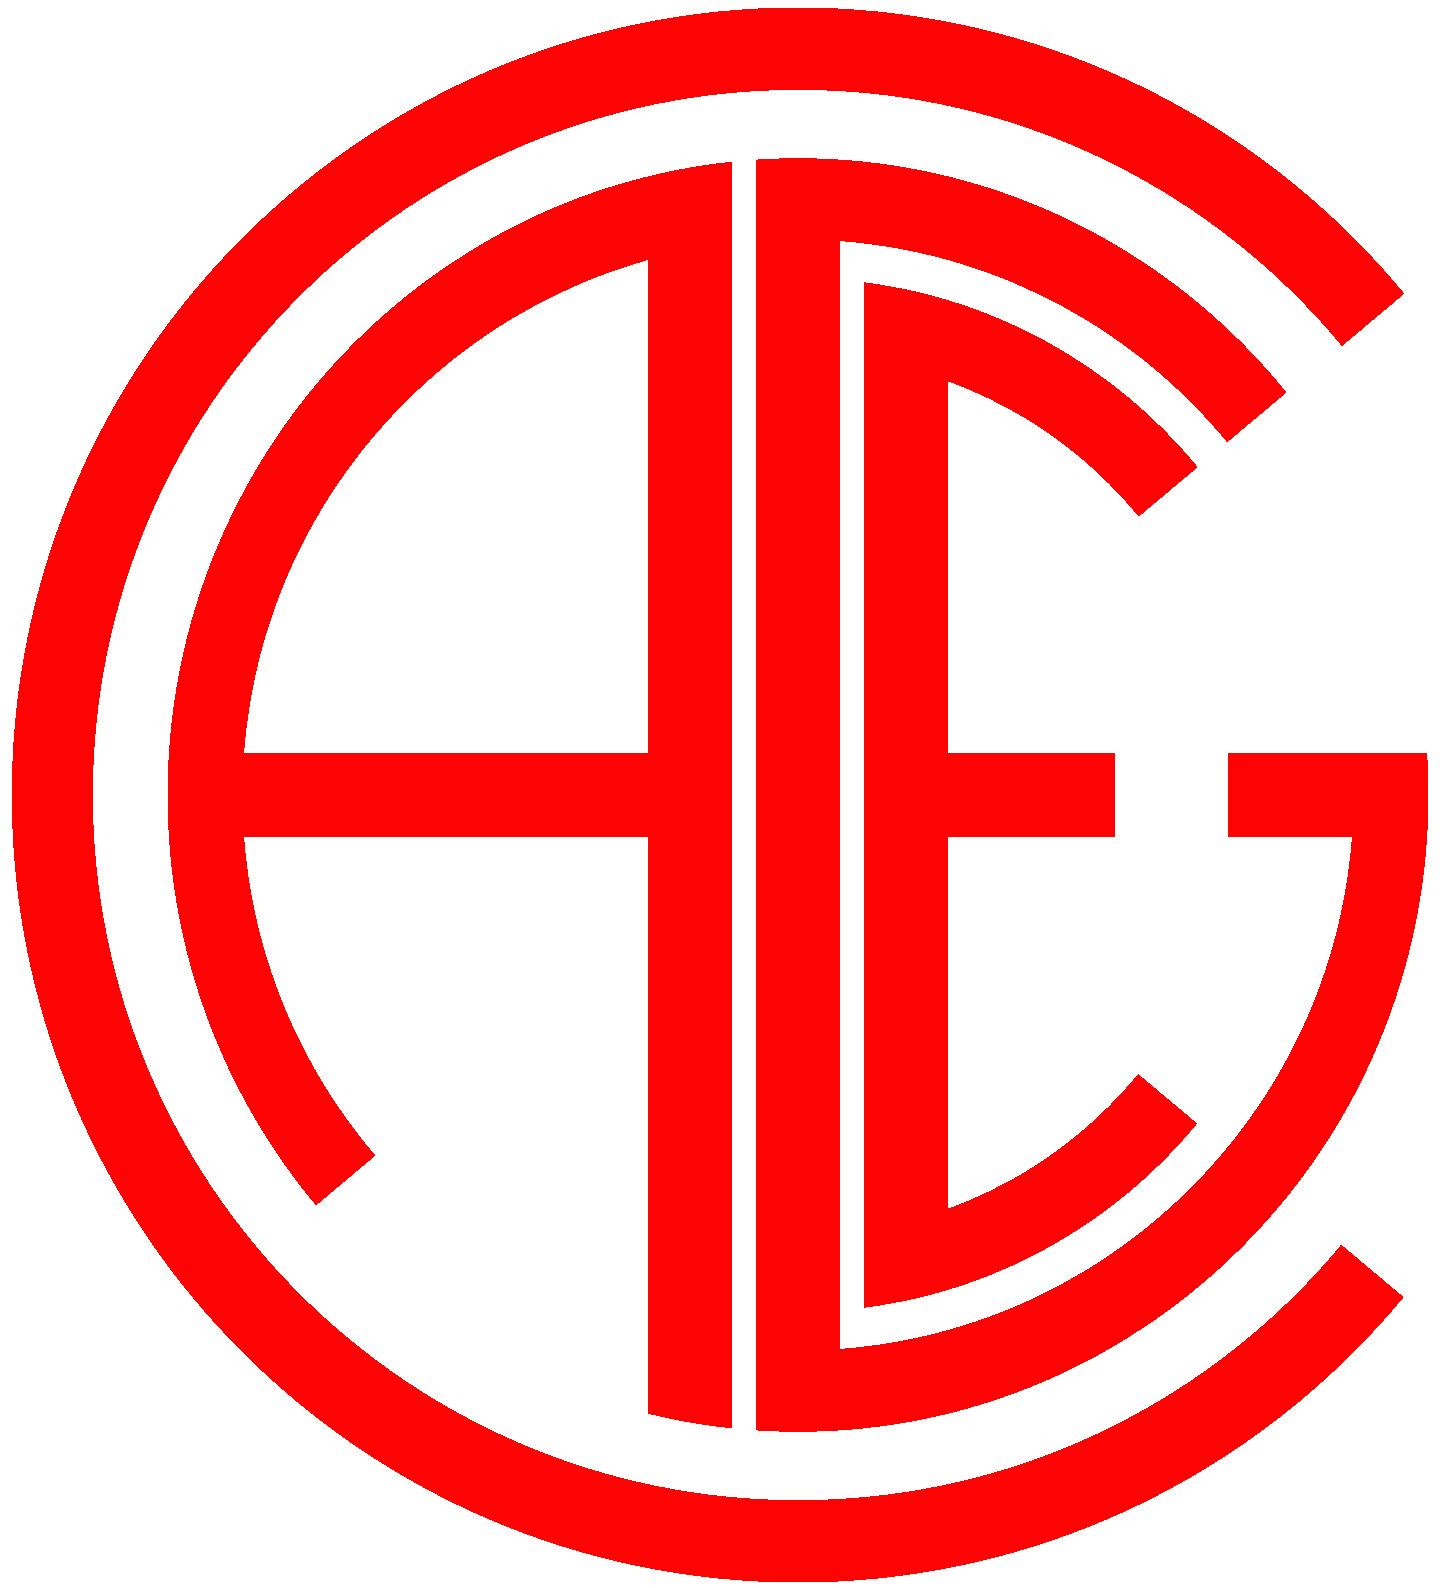 Avant-Garde Engineers & Consultants, Chennai, India